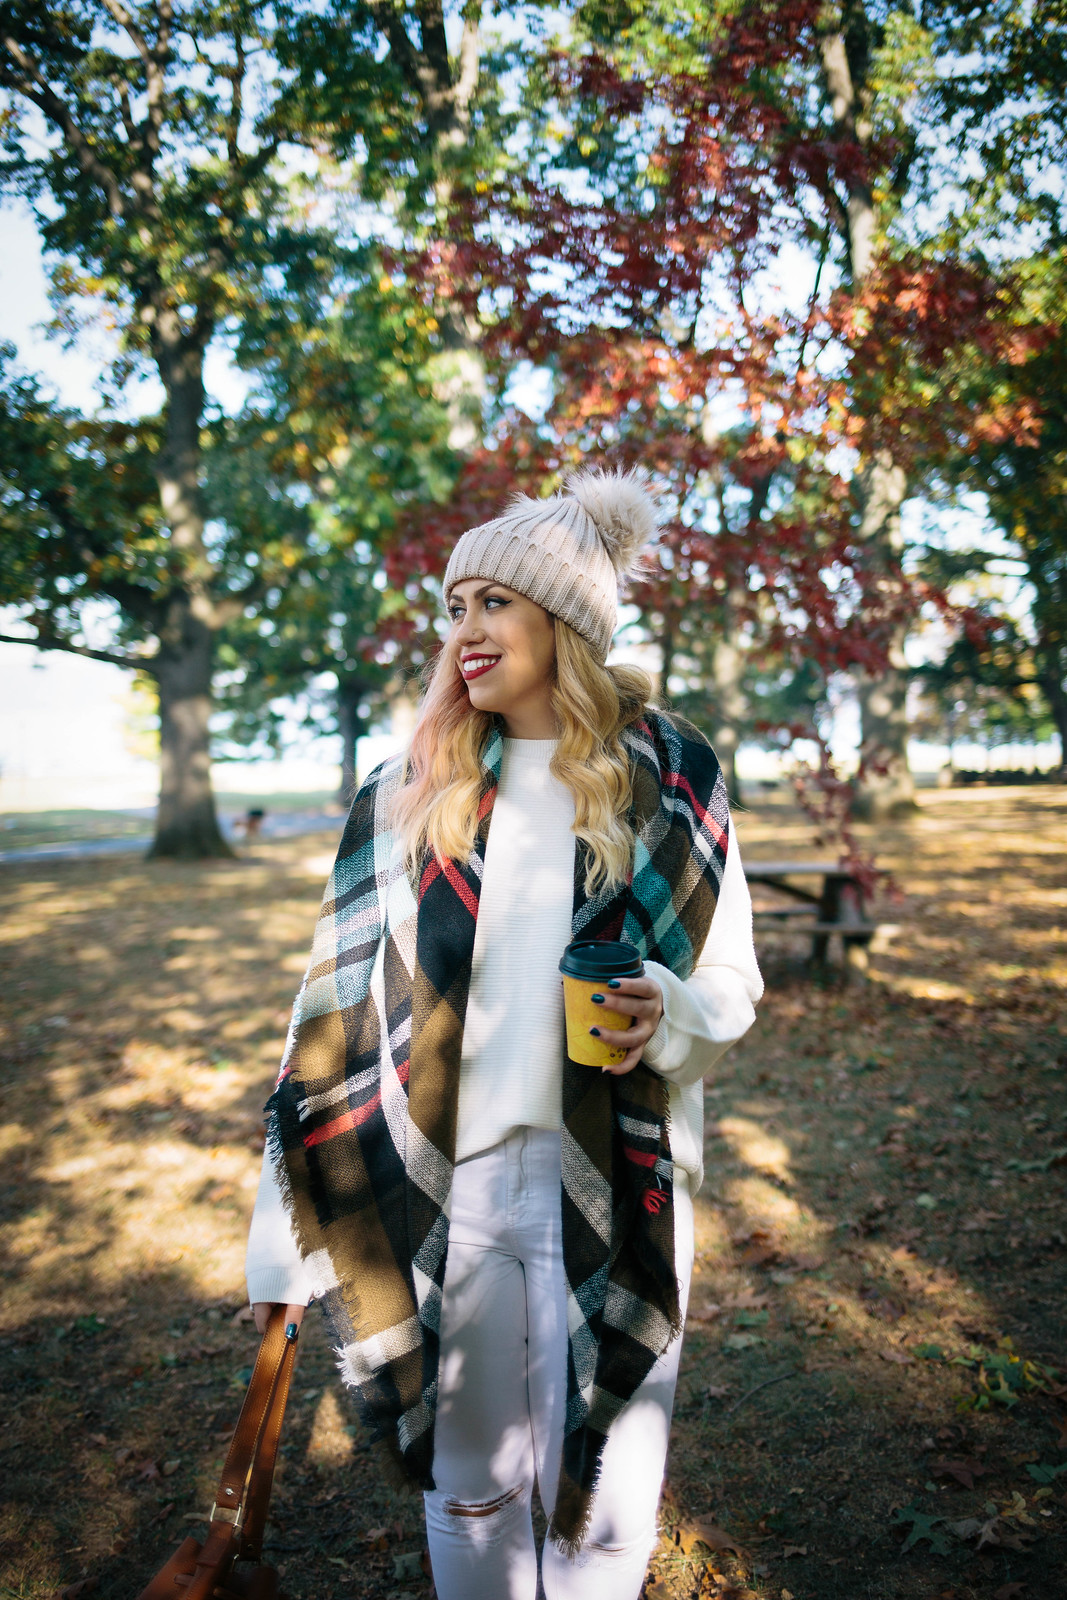 Fall Foliage Pom Pom Beanie Winter White Outfit Plaid Scarf